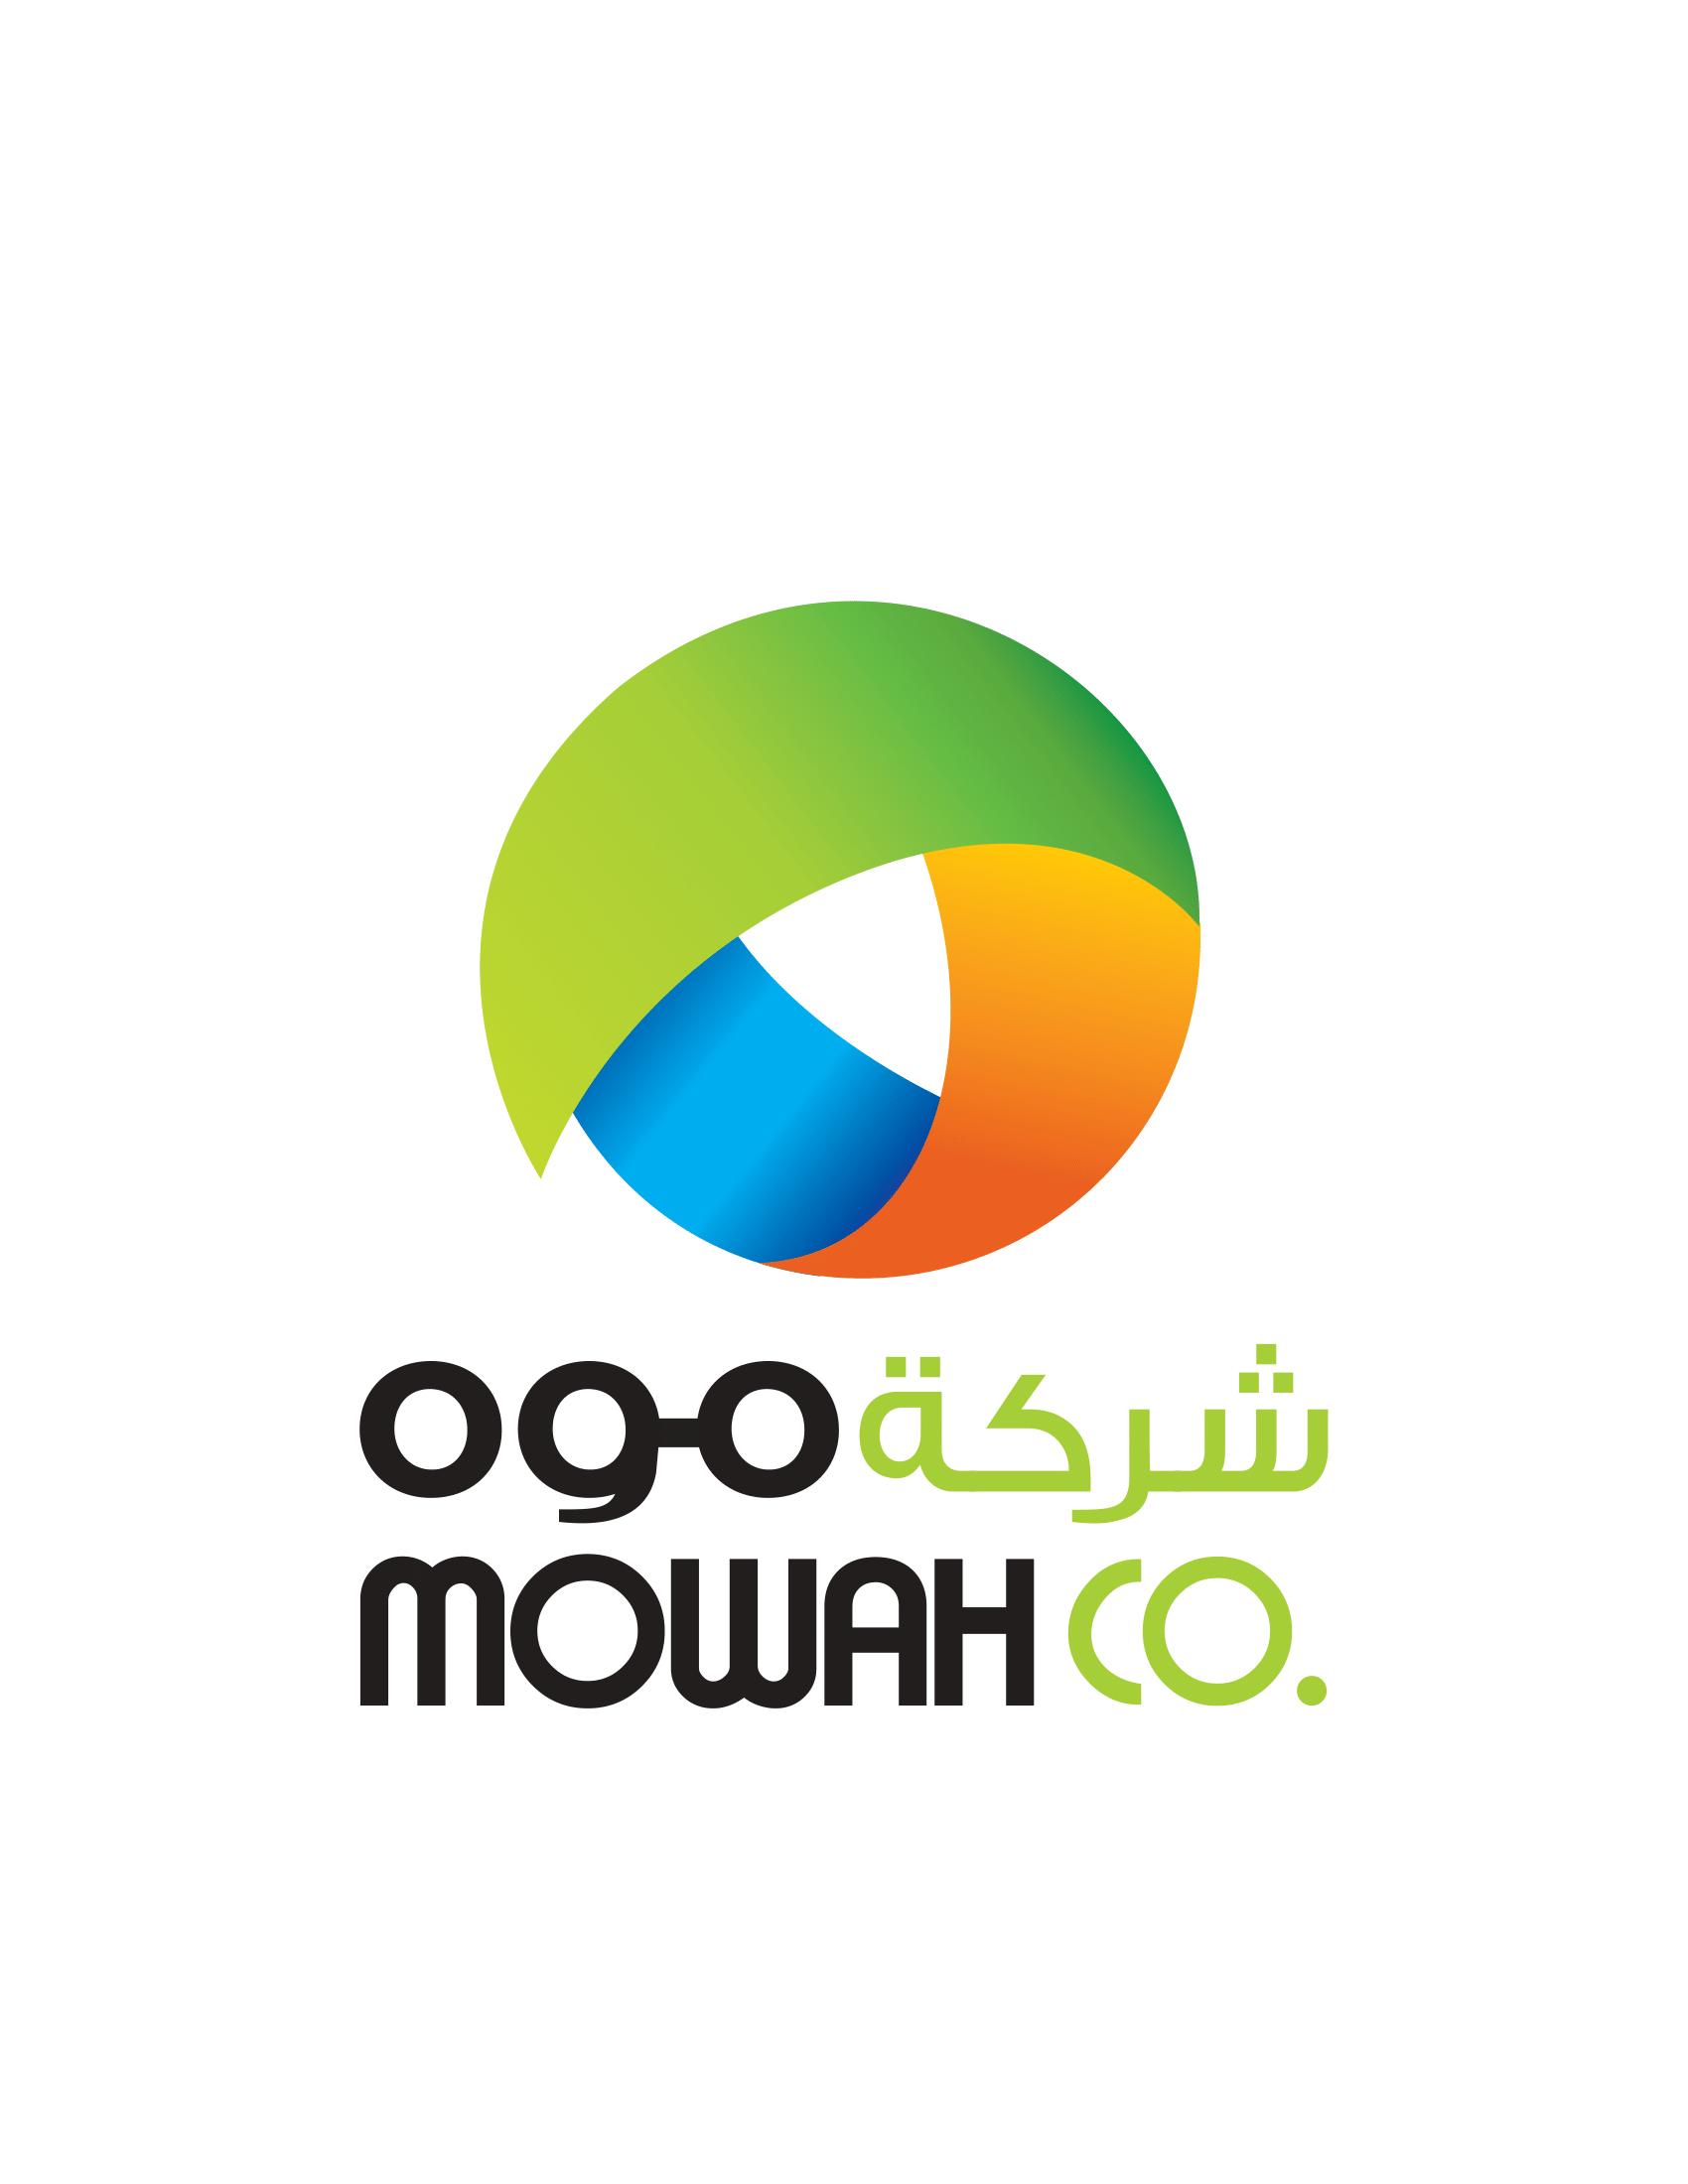 Mowah CO